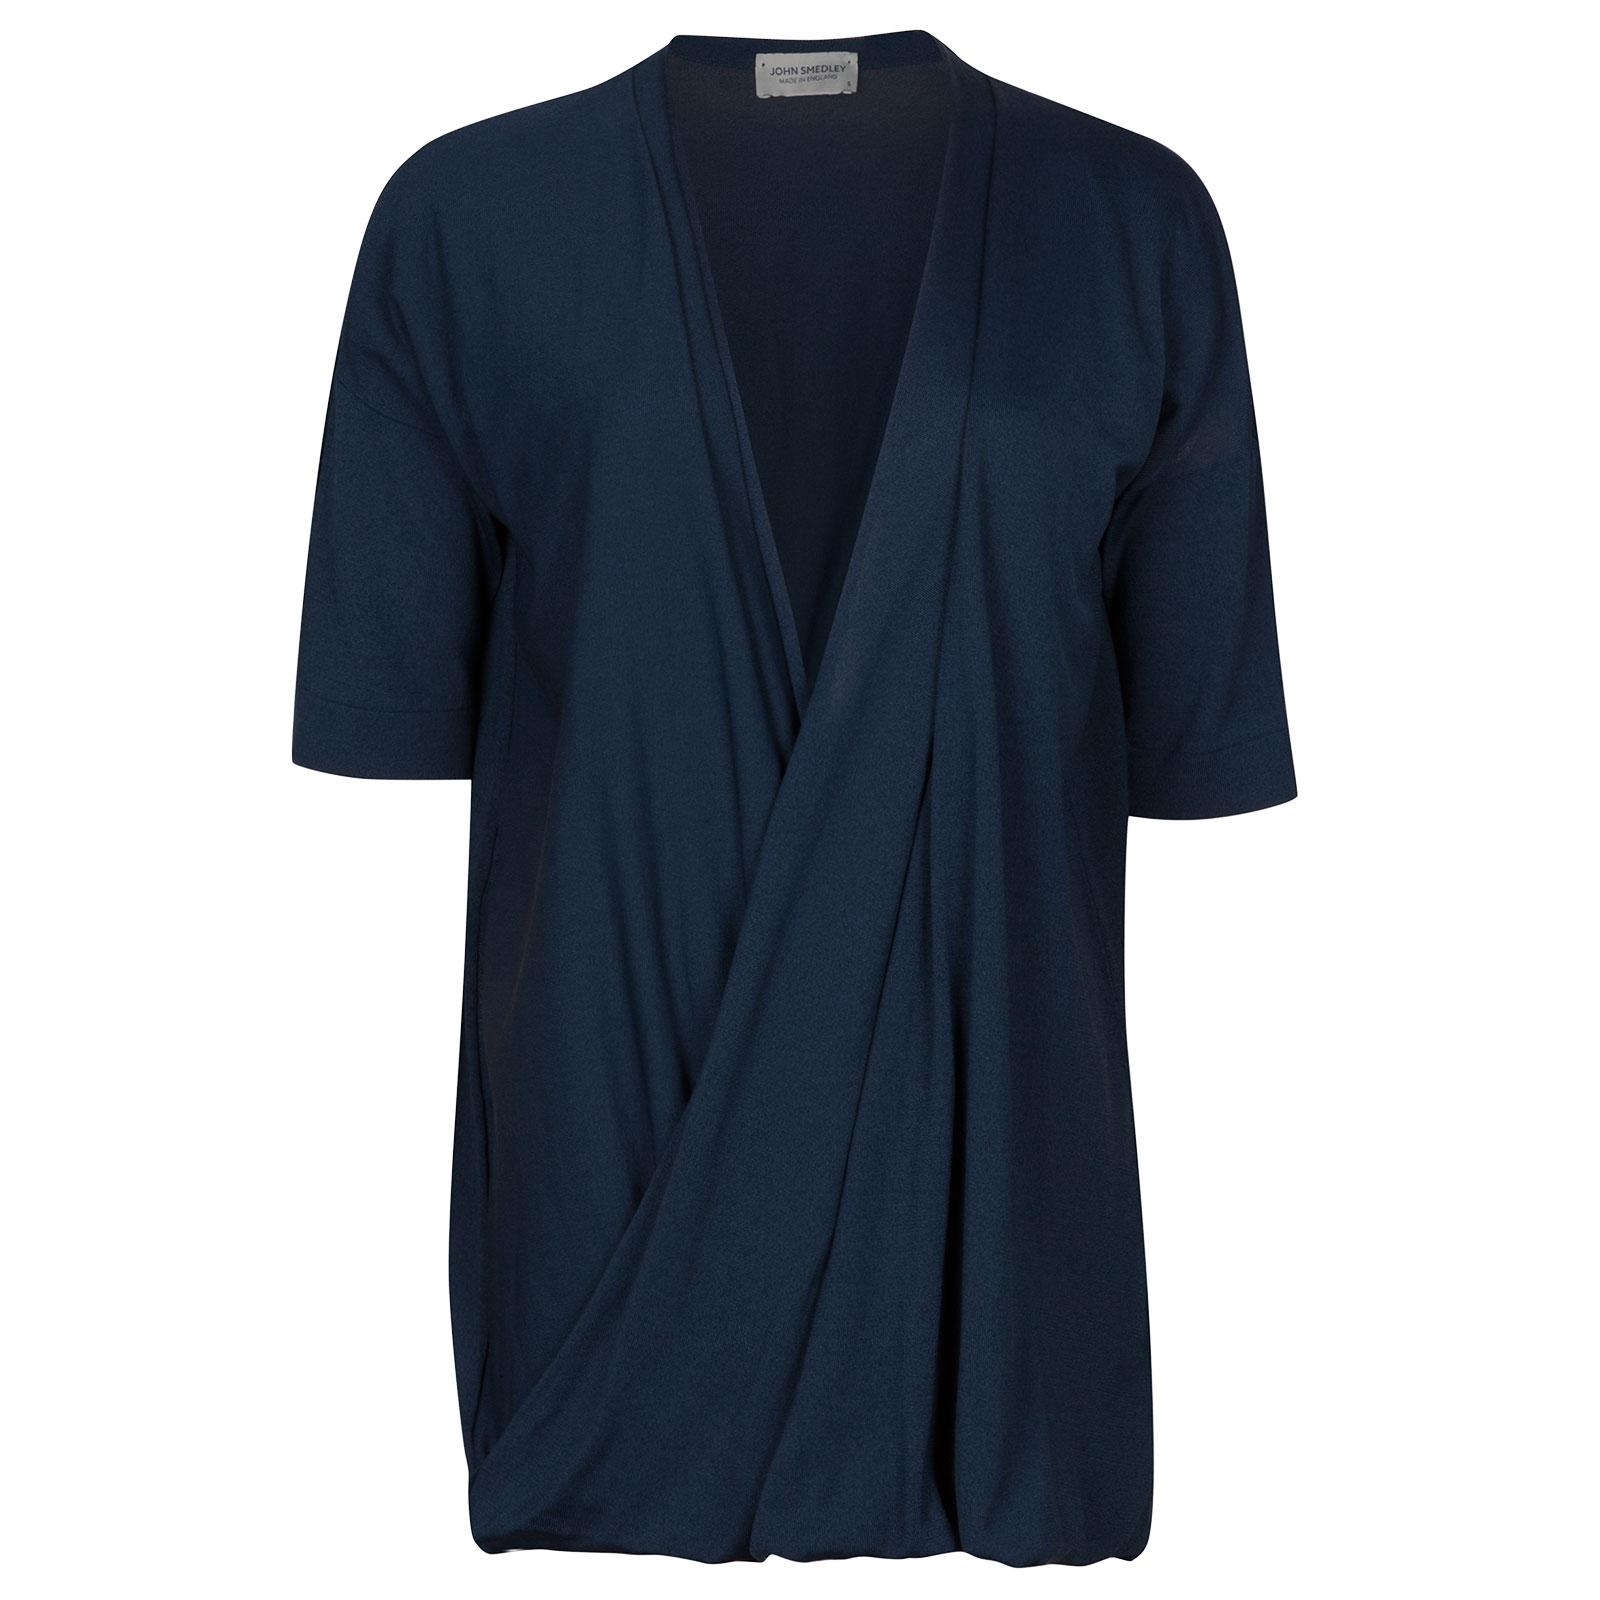 John Smedley Tiptree Merino Wool T-shirt in Indigo-S